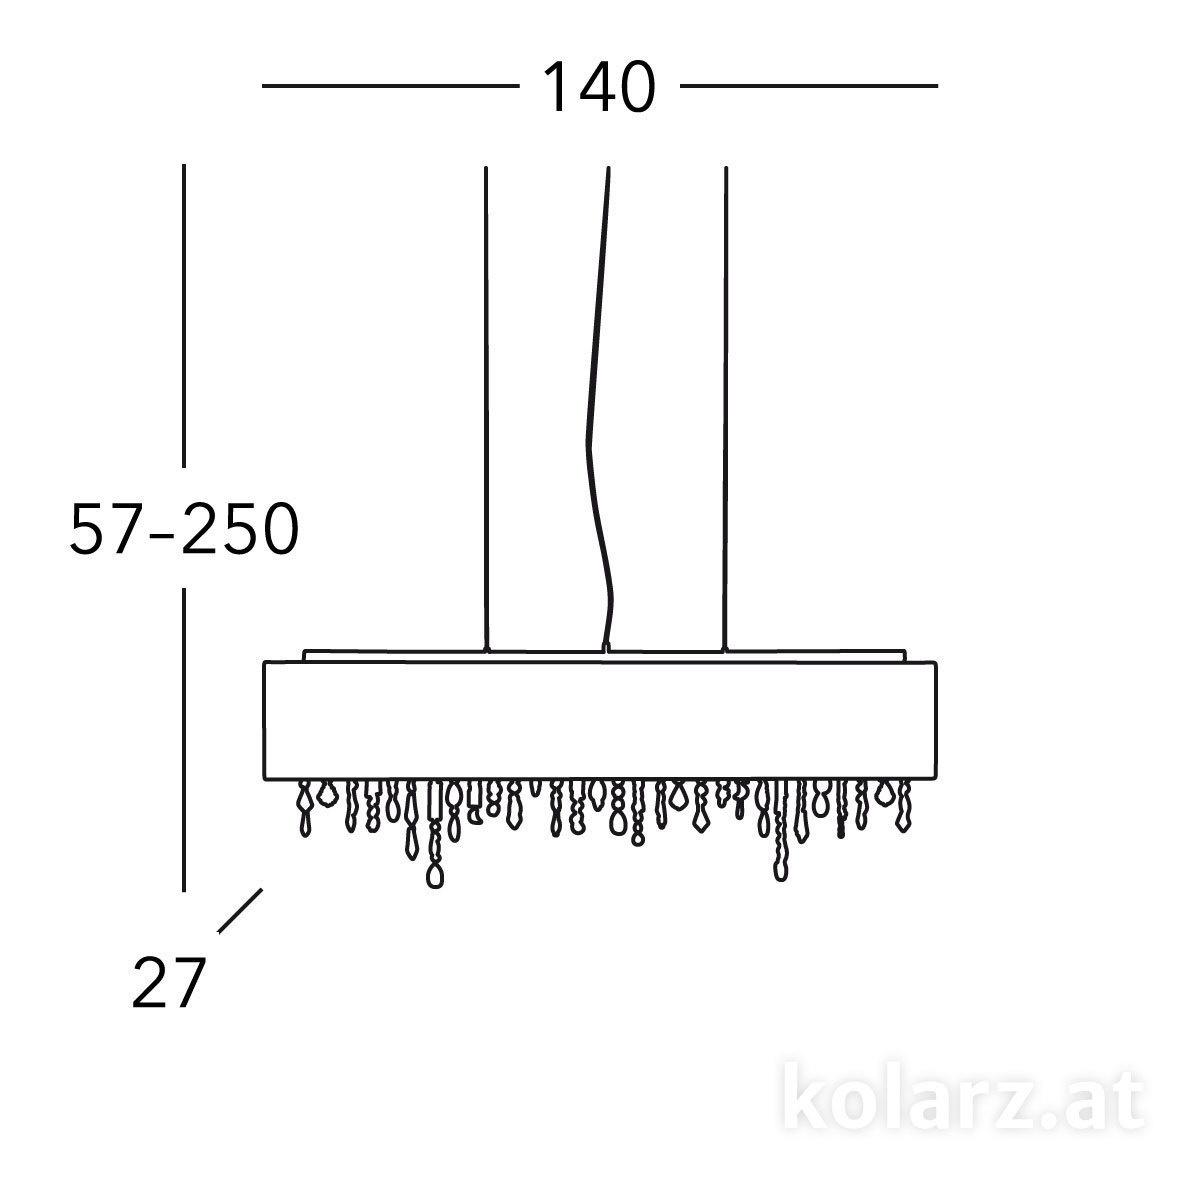 0240-87-5-Bk-STR_JET-s1.jpg